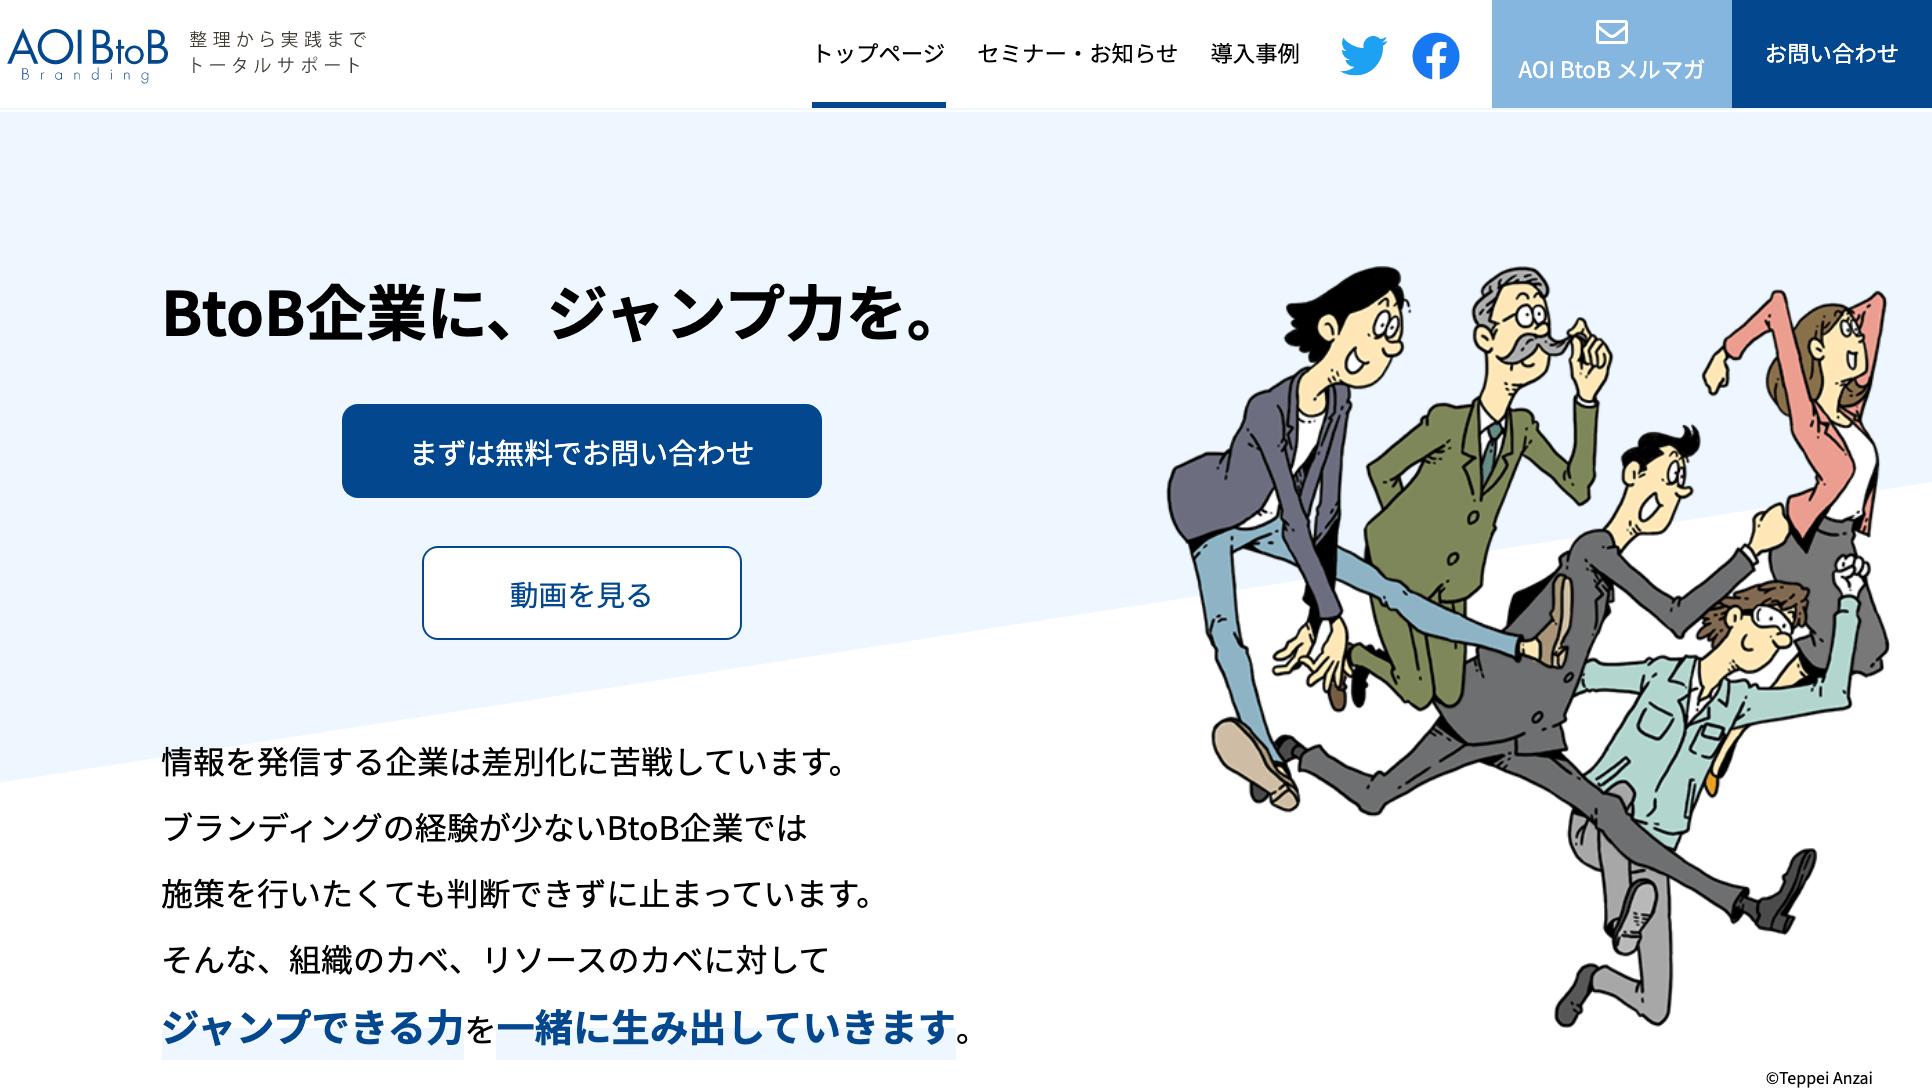 thumnail:株式会社AOI Pro.さまの事業